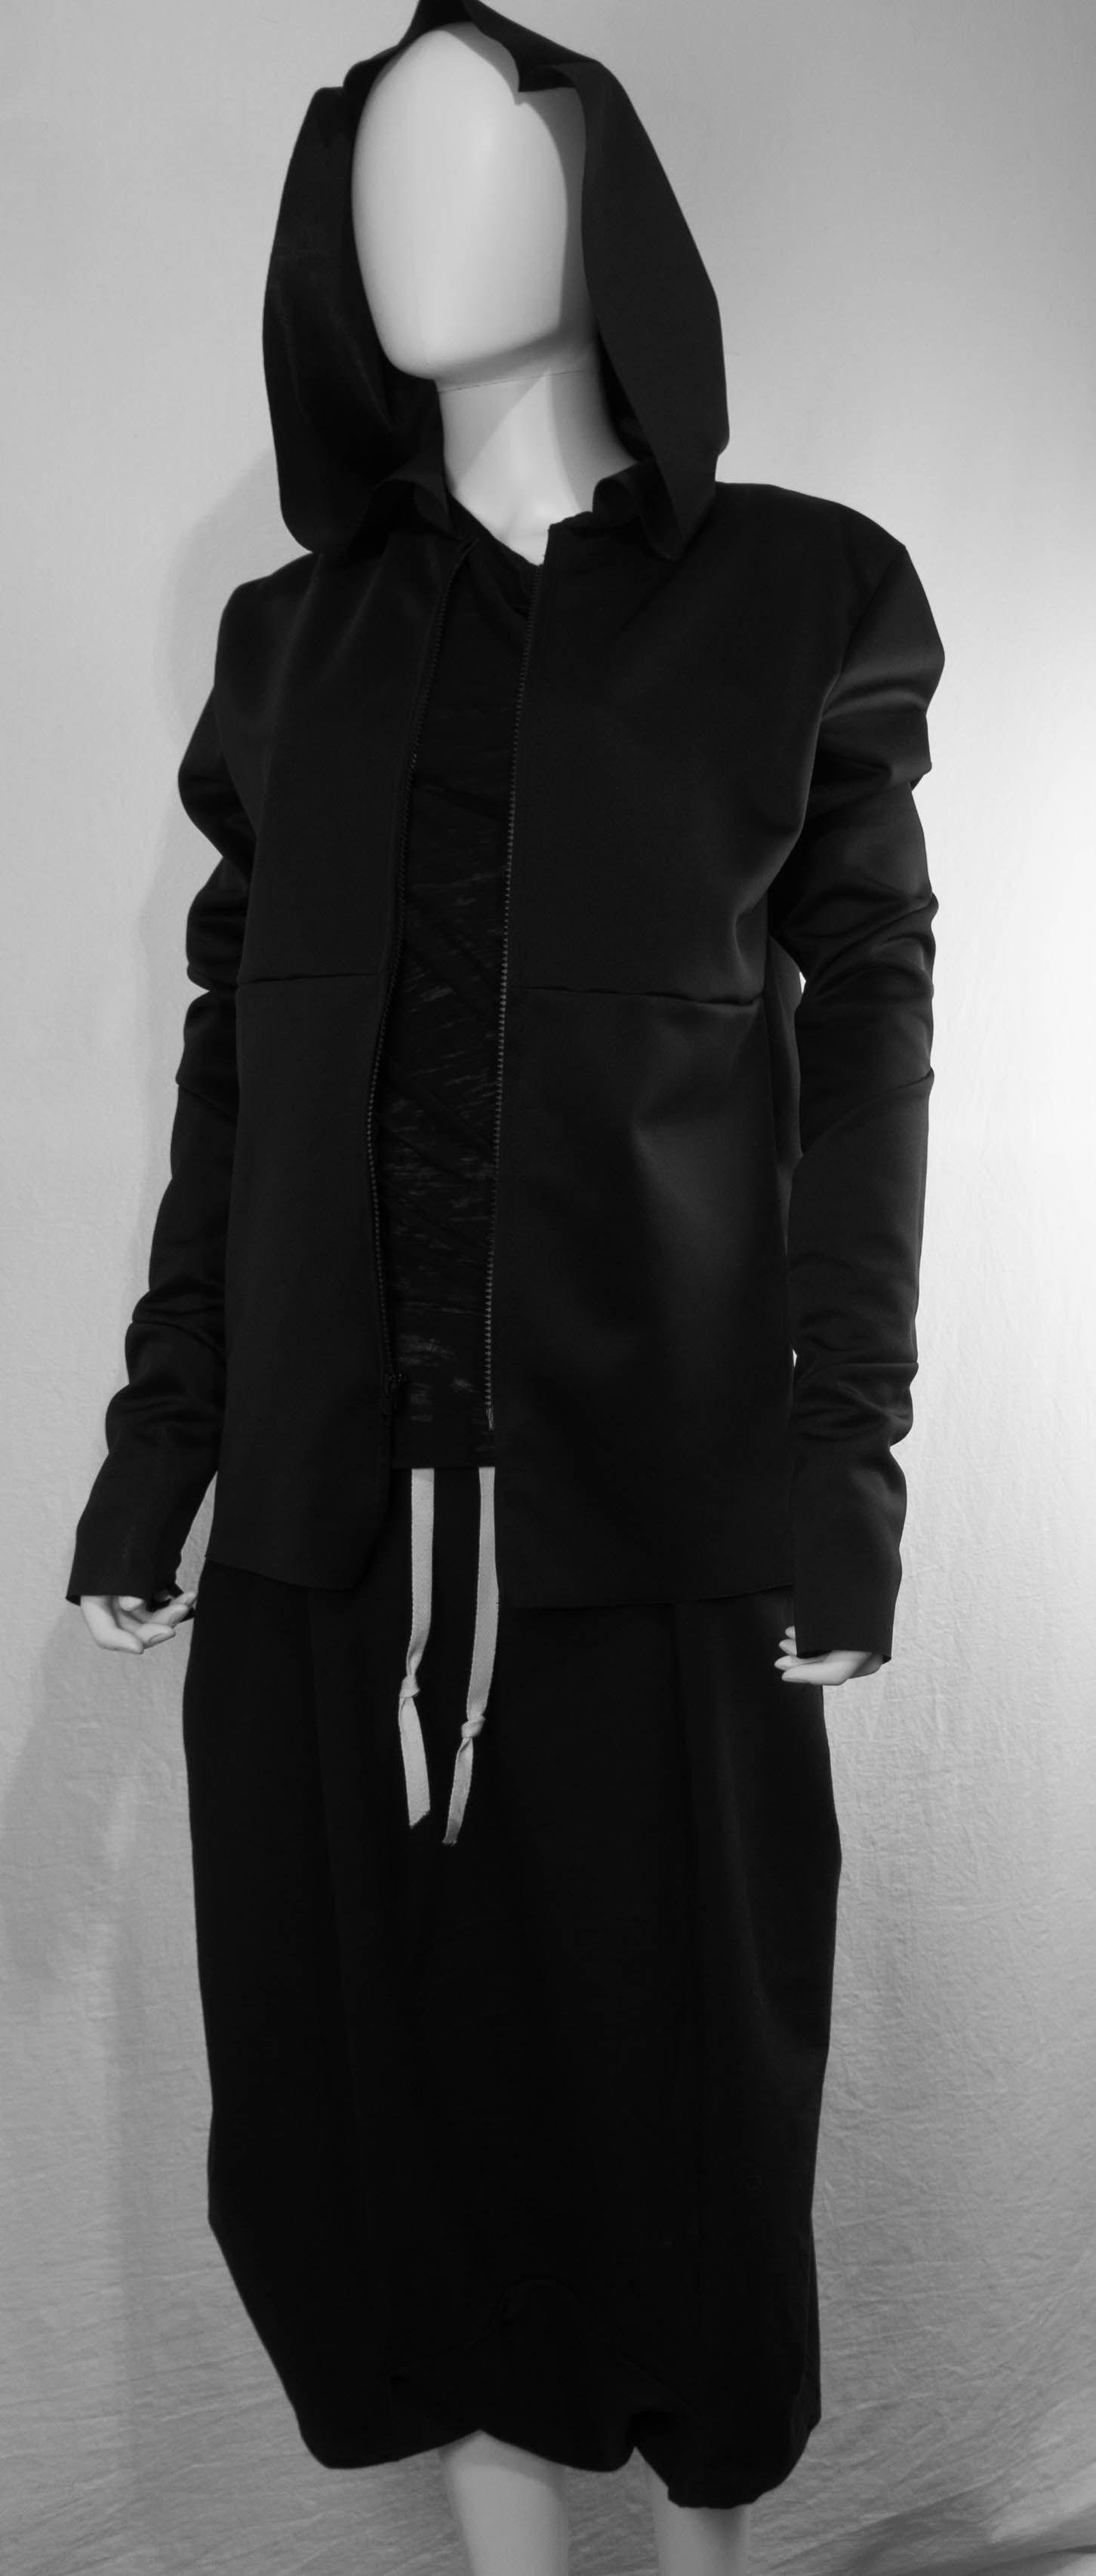 6ec24be51 Dark Streetwear - SexismIsOver